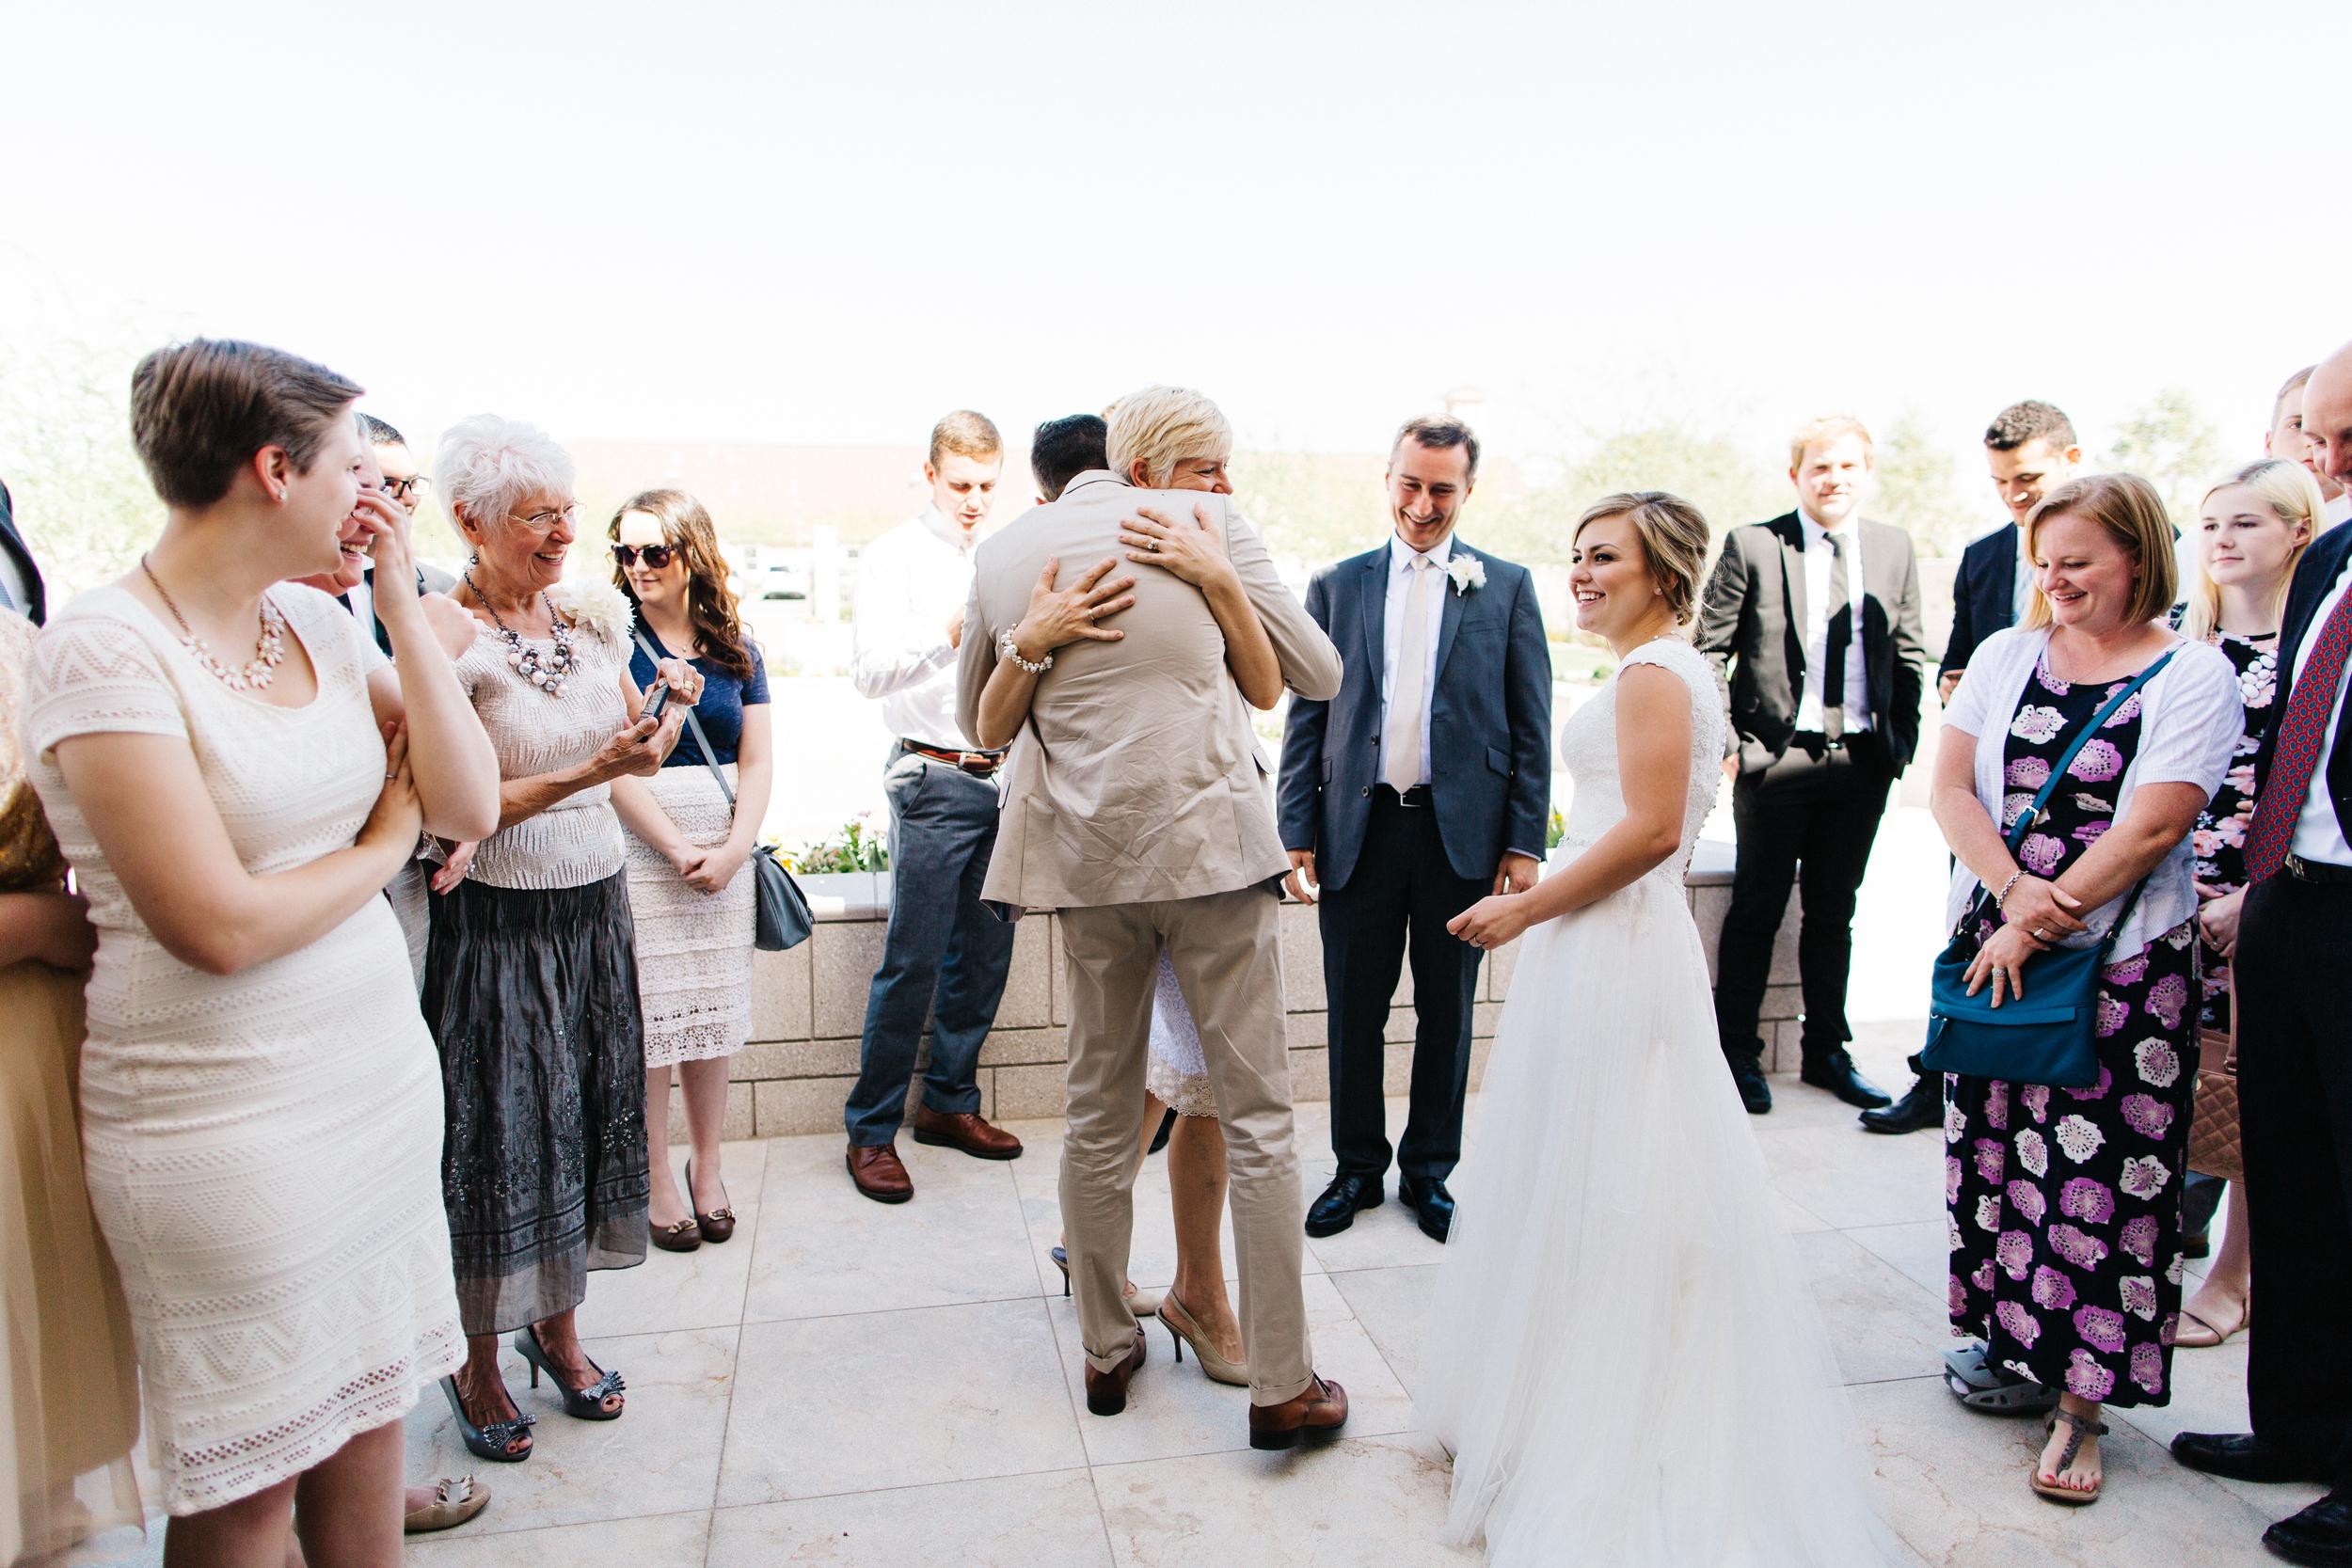 KennedyWyatt_WeddingDay-25.jpg